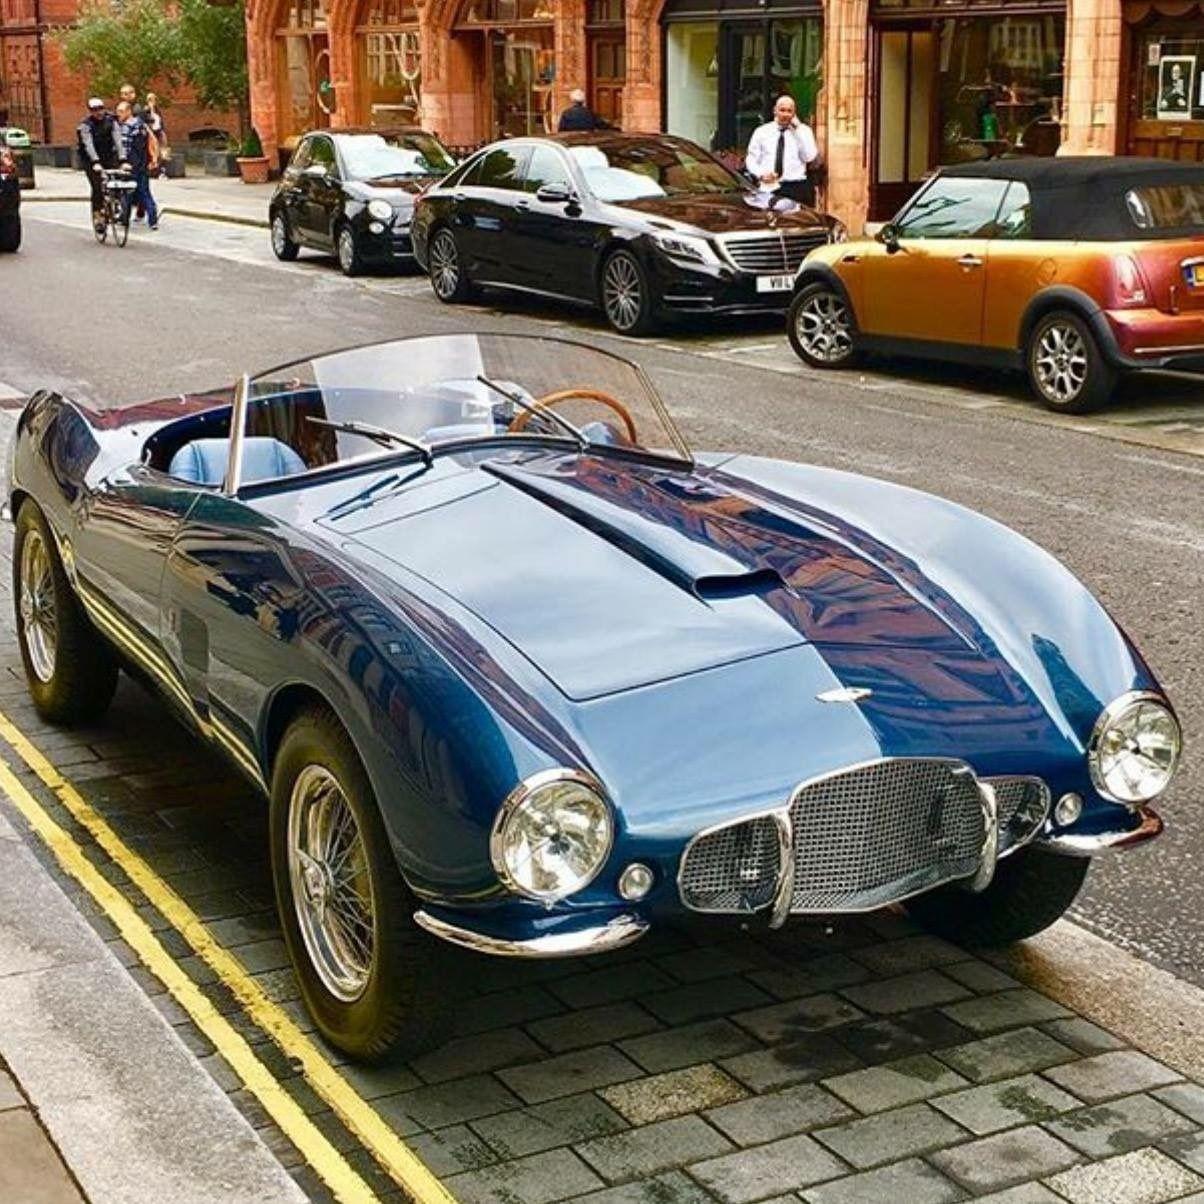 Aston Martin convertible – Wow, that's gorgeous! #Classic #SportsCar #Style #Des…